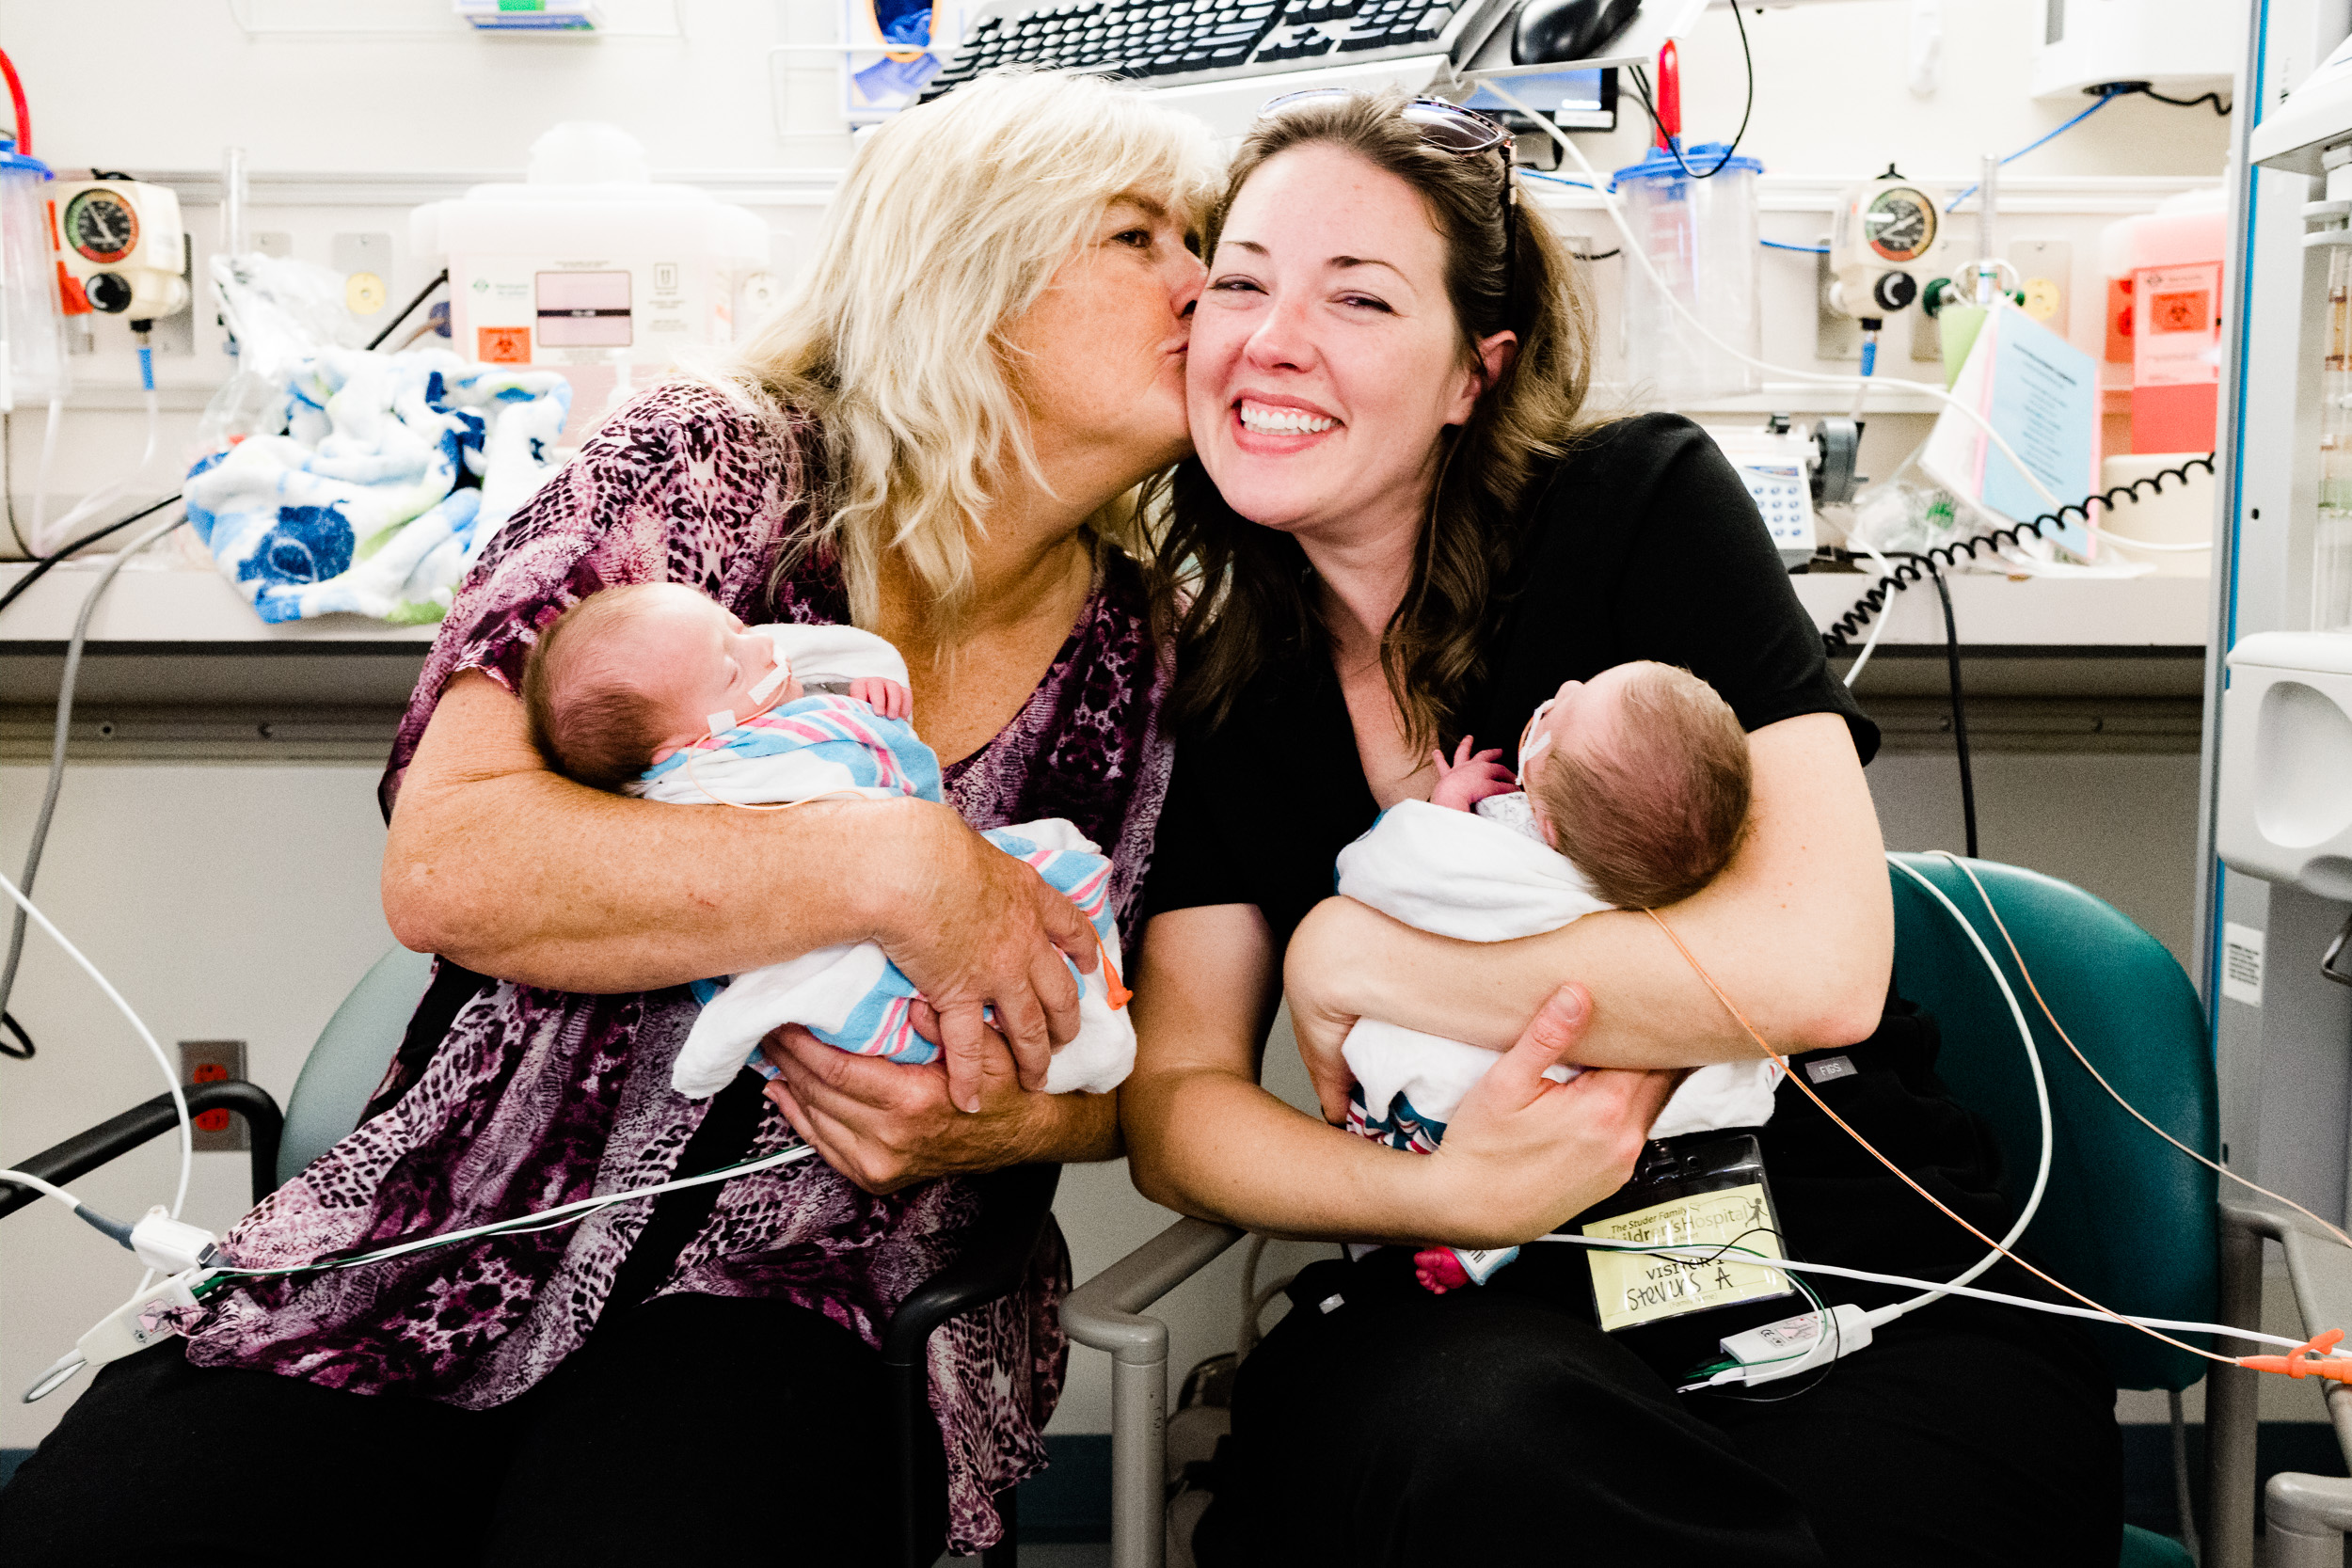 pensacola-newborn-photographer